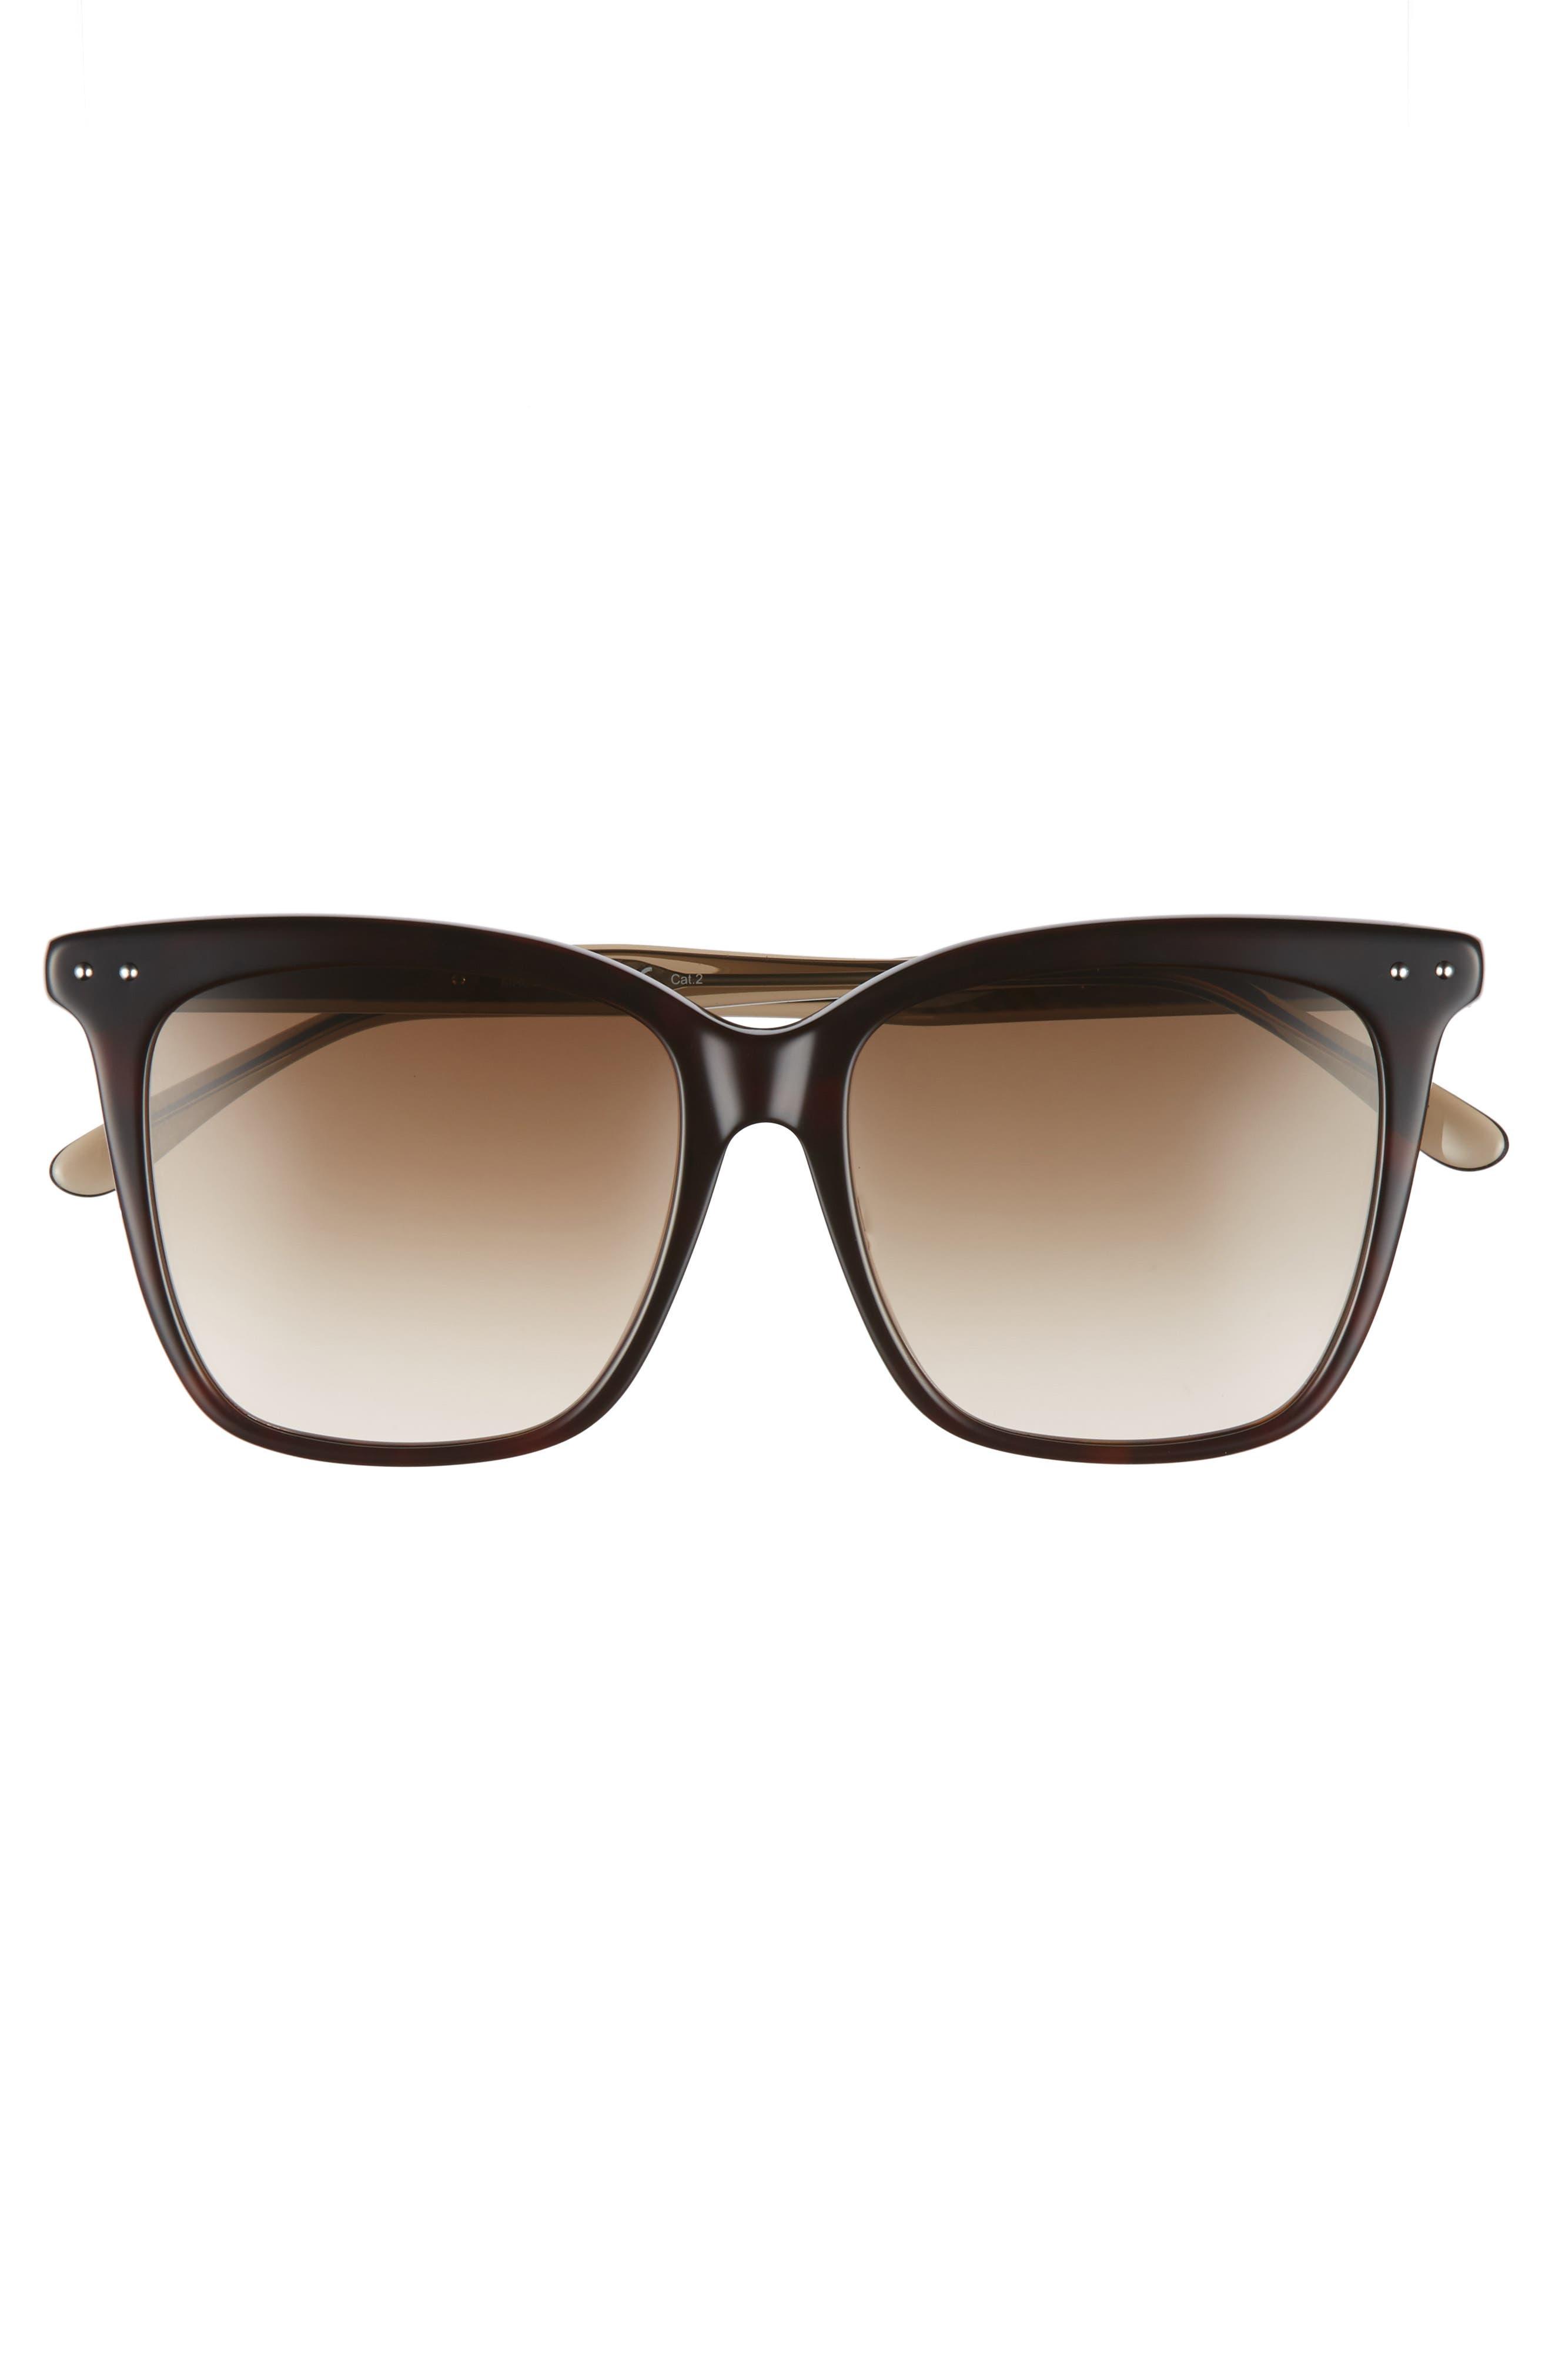 54mm Square Sunglasses,                             Alternate thumbnail 9, color,